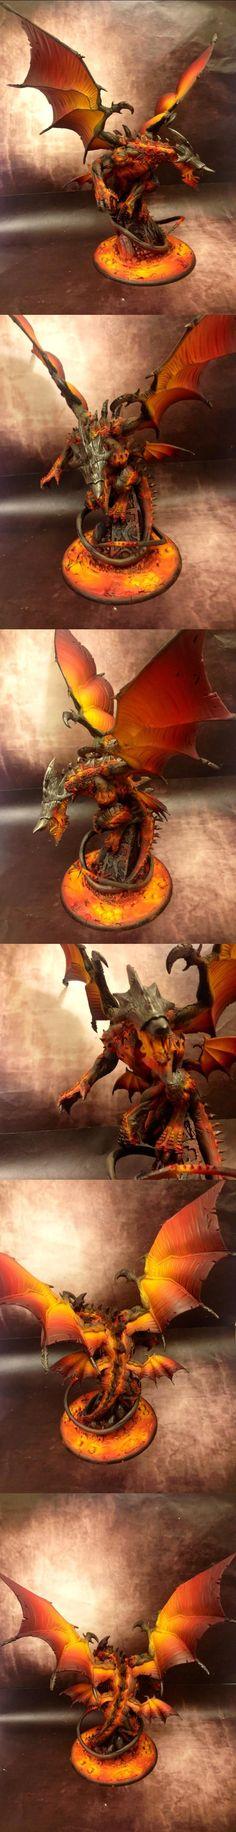 Aosol, Dragon, Everblight, Hordes, Lava, Legion Of Everblight, Object Source Lighting - Legion of Everblight Archangel - Gallery - DakkaDakka | So good we named it twice.